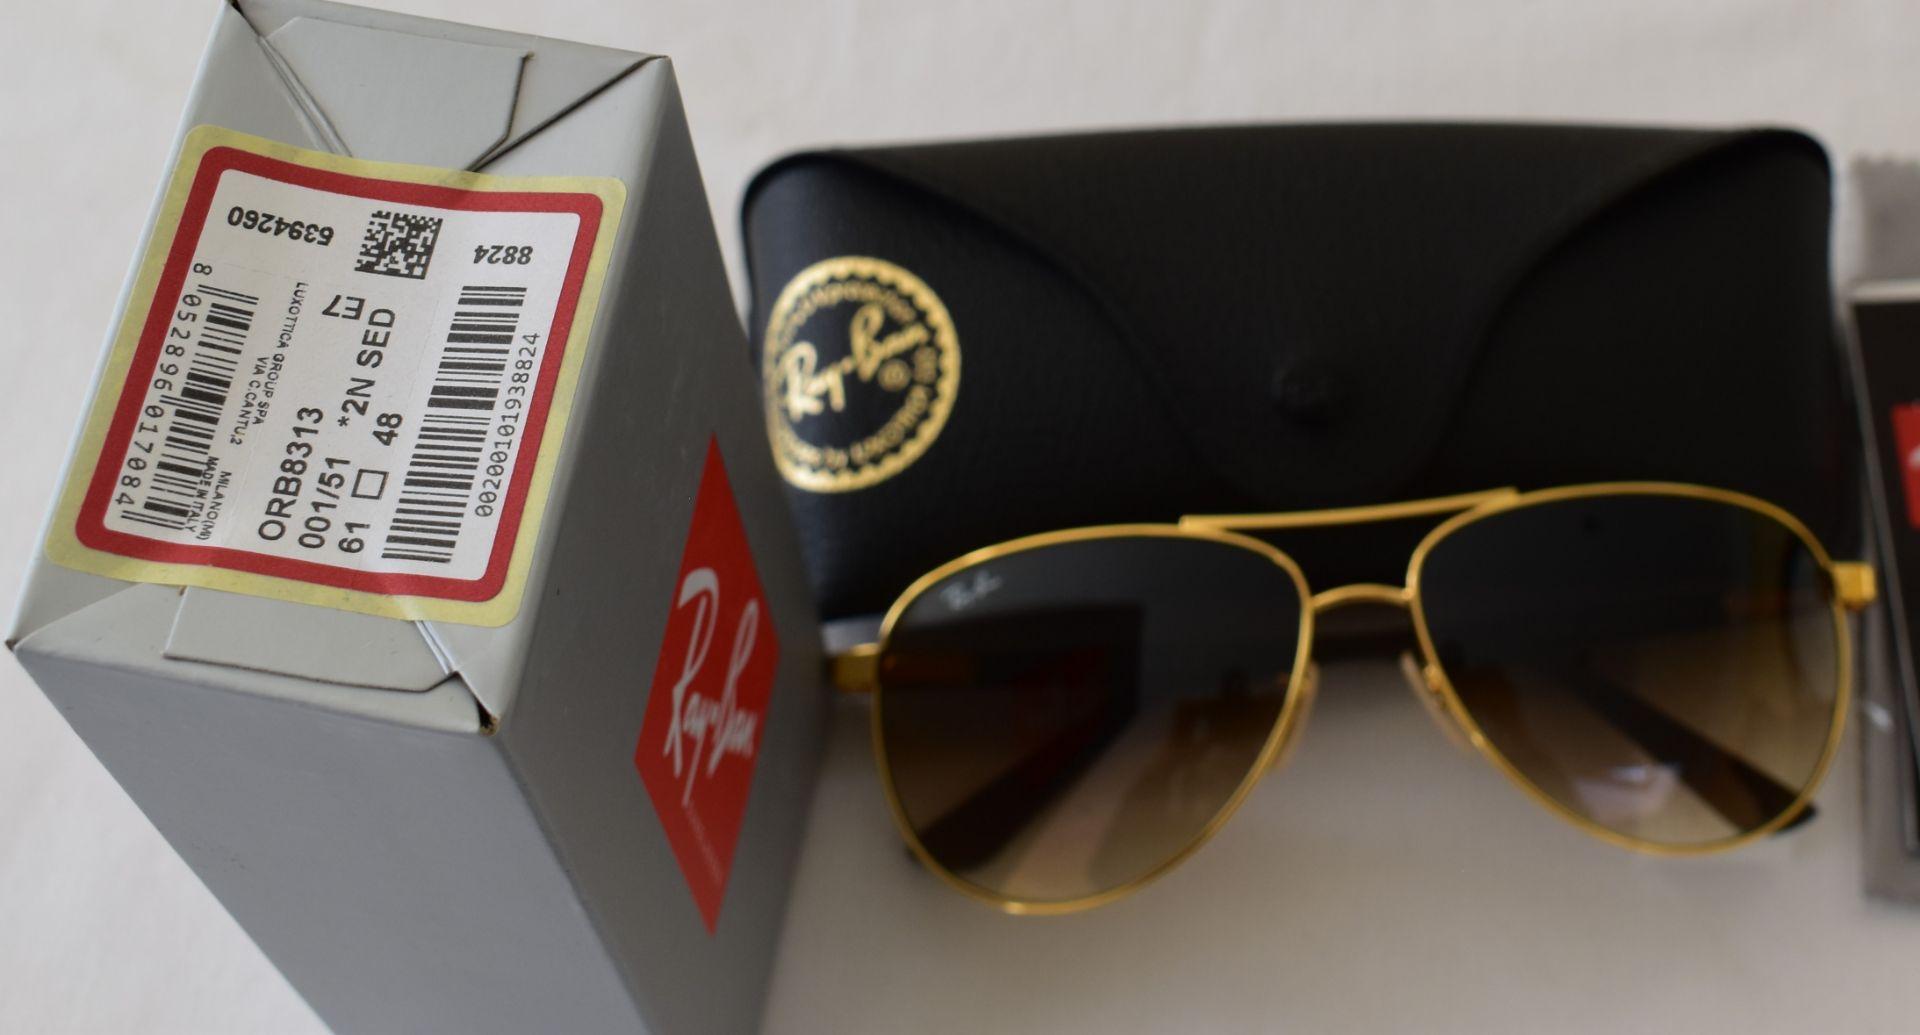 Ray Ban Sunglasses ORB8313 001/51 *2N - Image 2 of 2